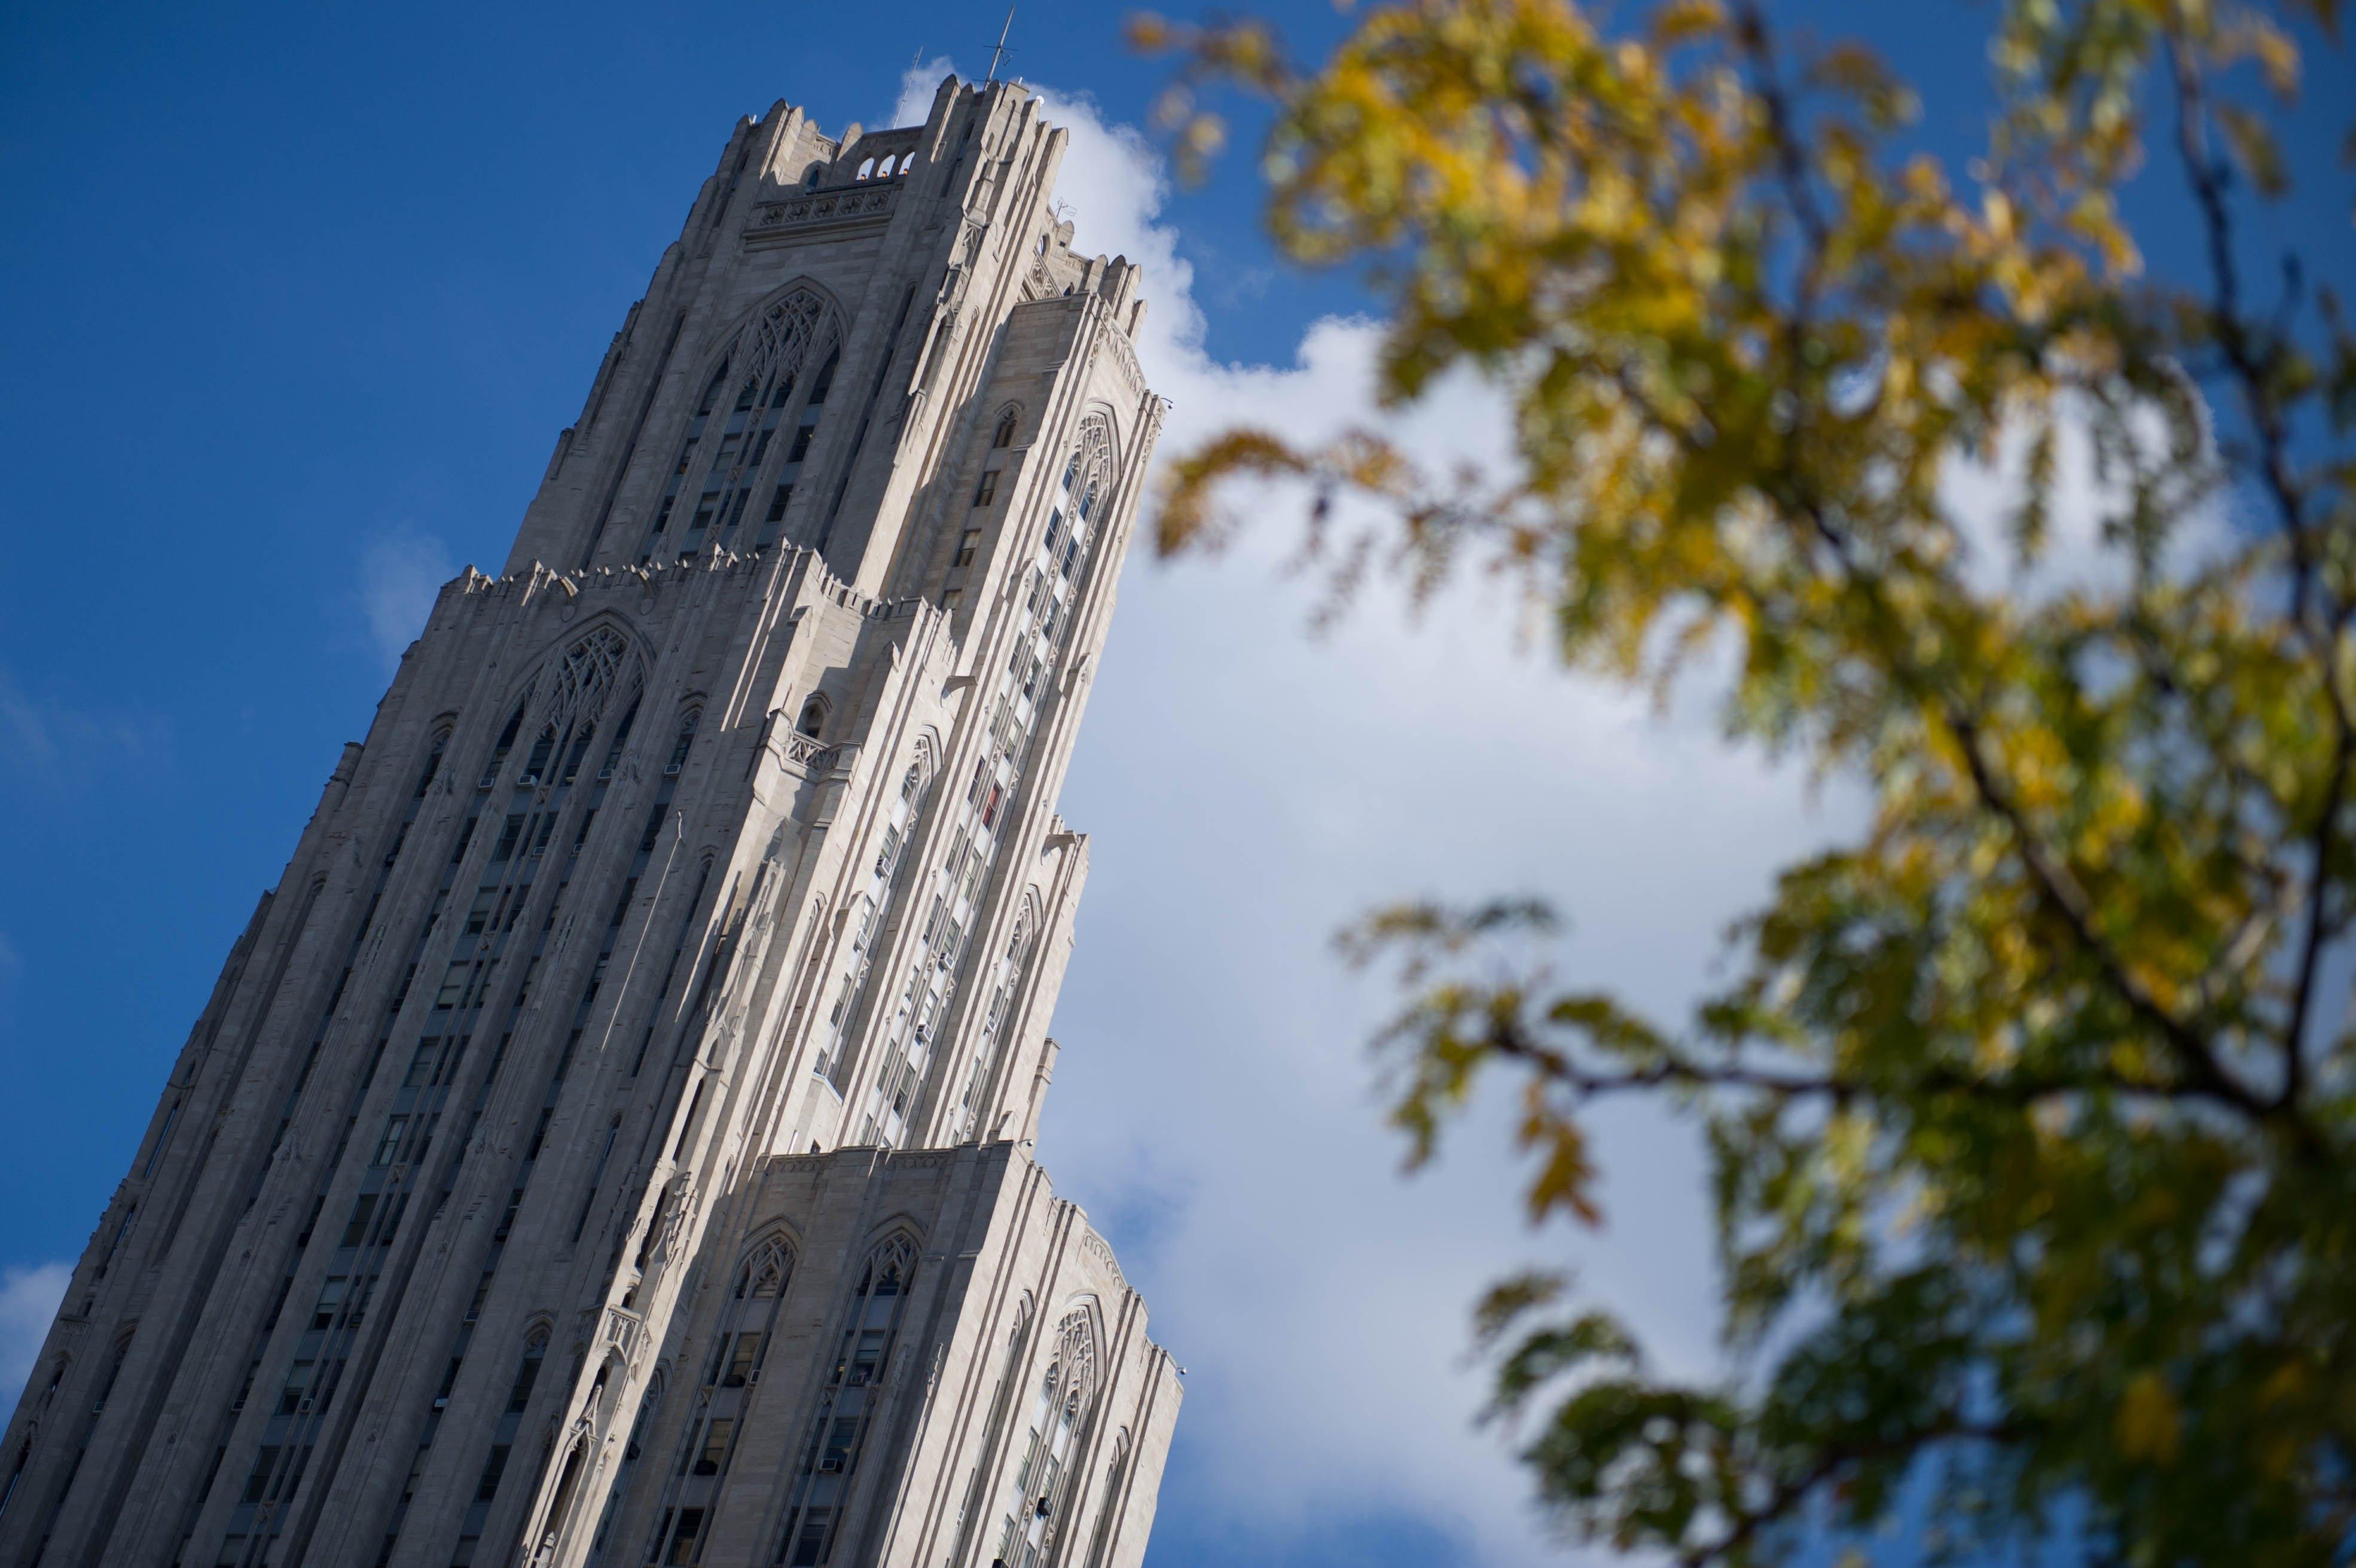 Pitt Accounting Cpe Conference 2019 | Joseph M. Katz Graduate School U Pitt Calendar 2019